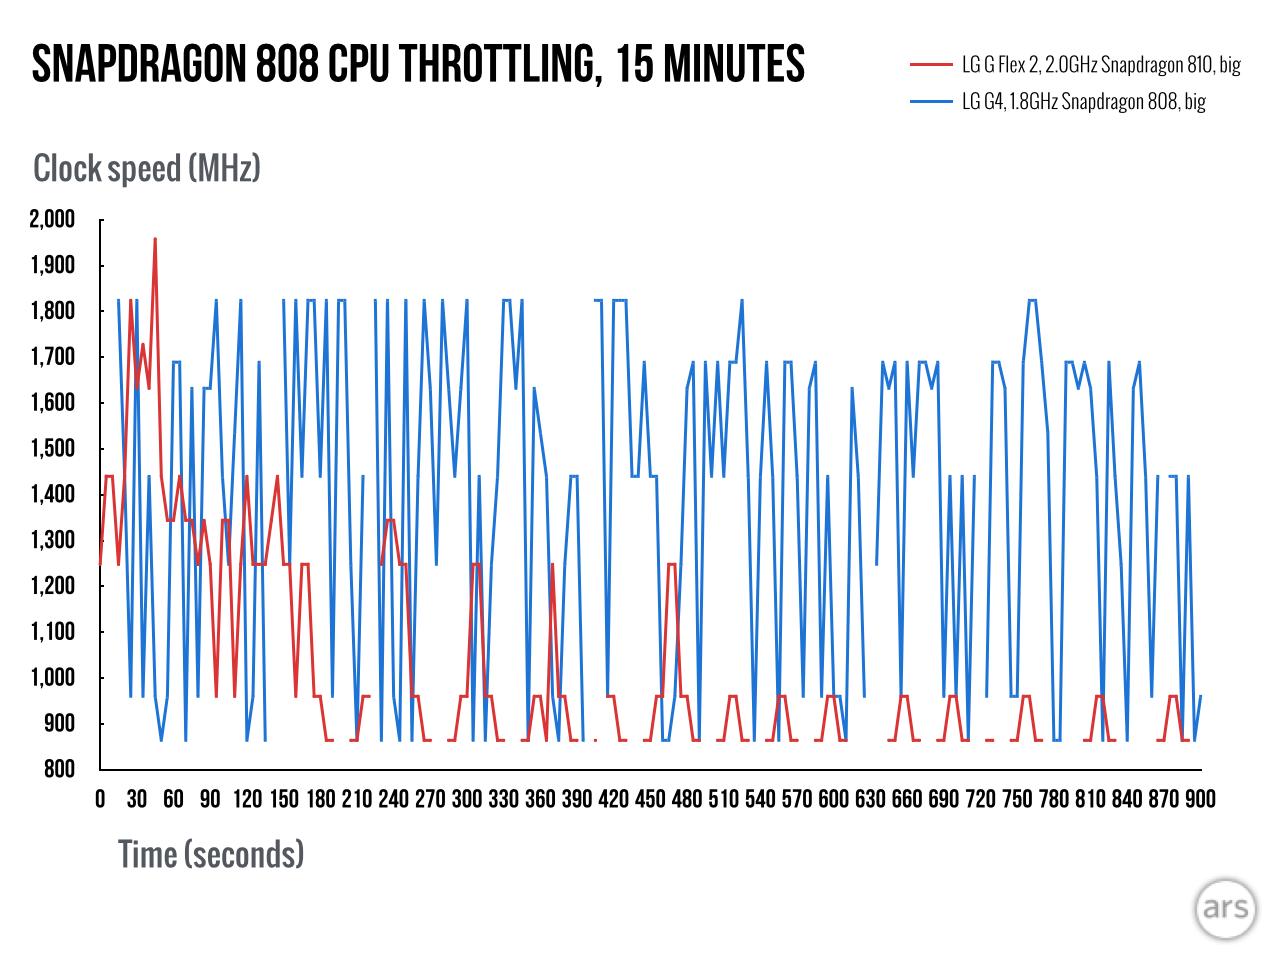 Snapdragon-808-throttling